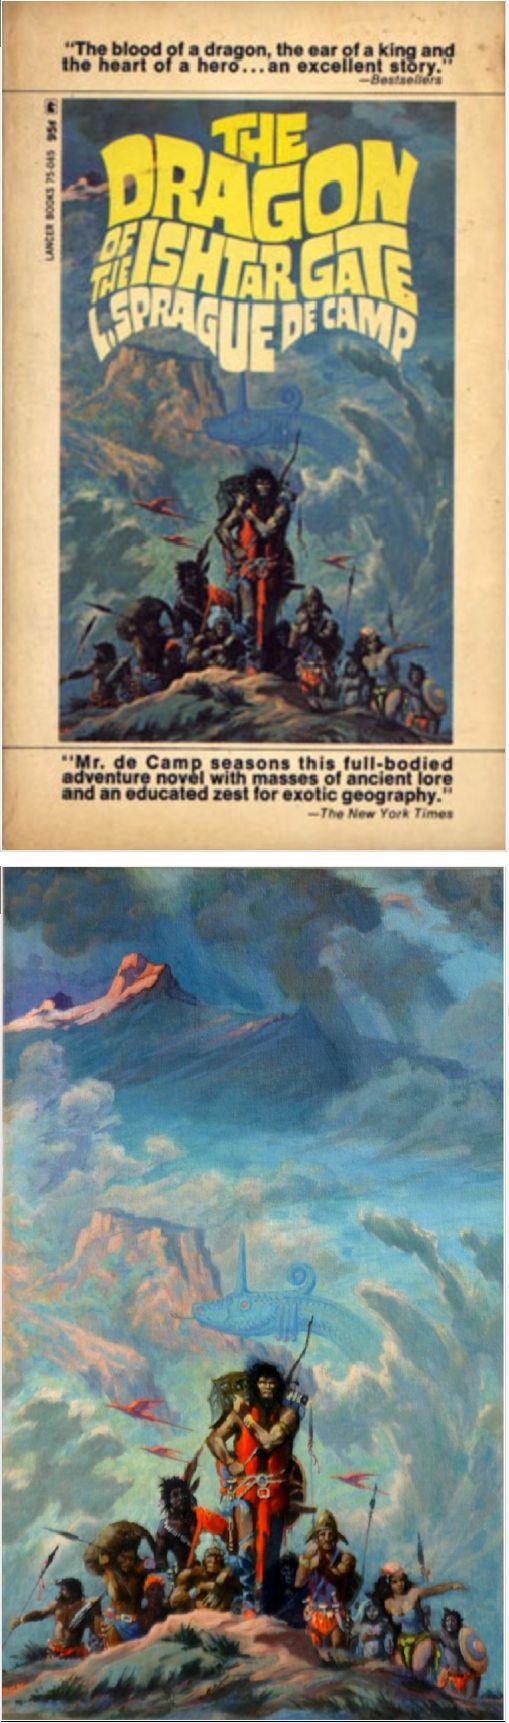 ROY G. KRENKEL JR  - The Dragon of the Ishtar Gate by L. Sprague de Camp - 1968 Lancer Books - cover by isfdb